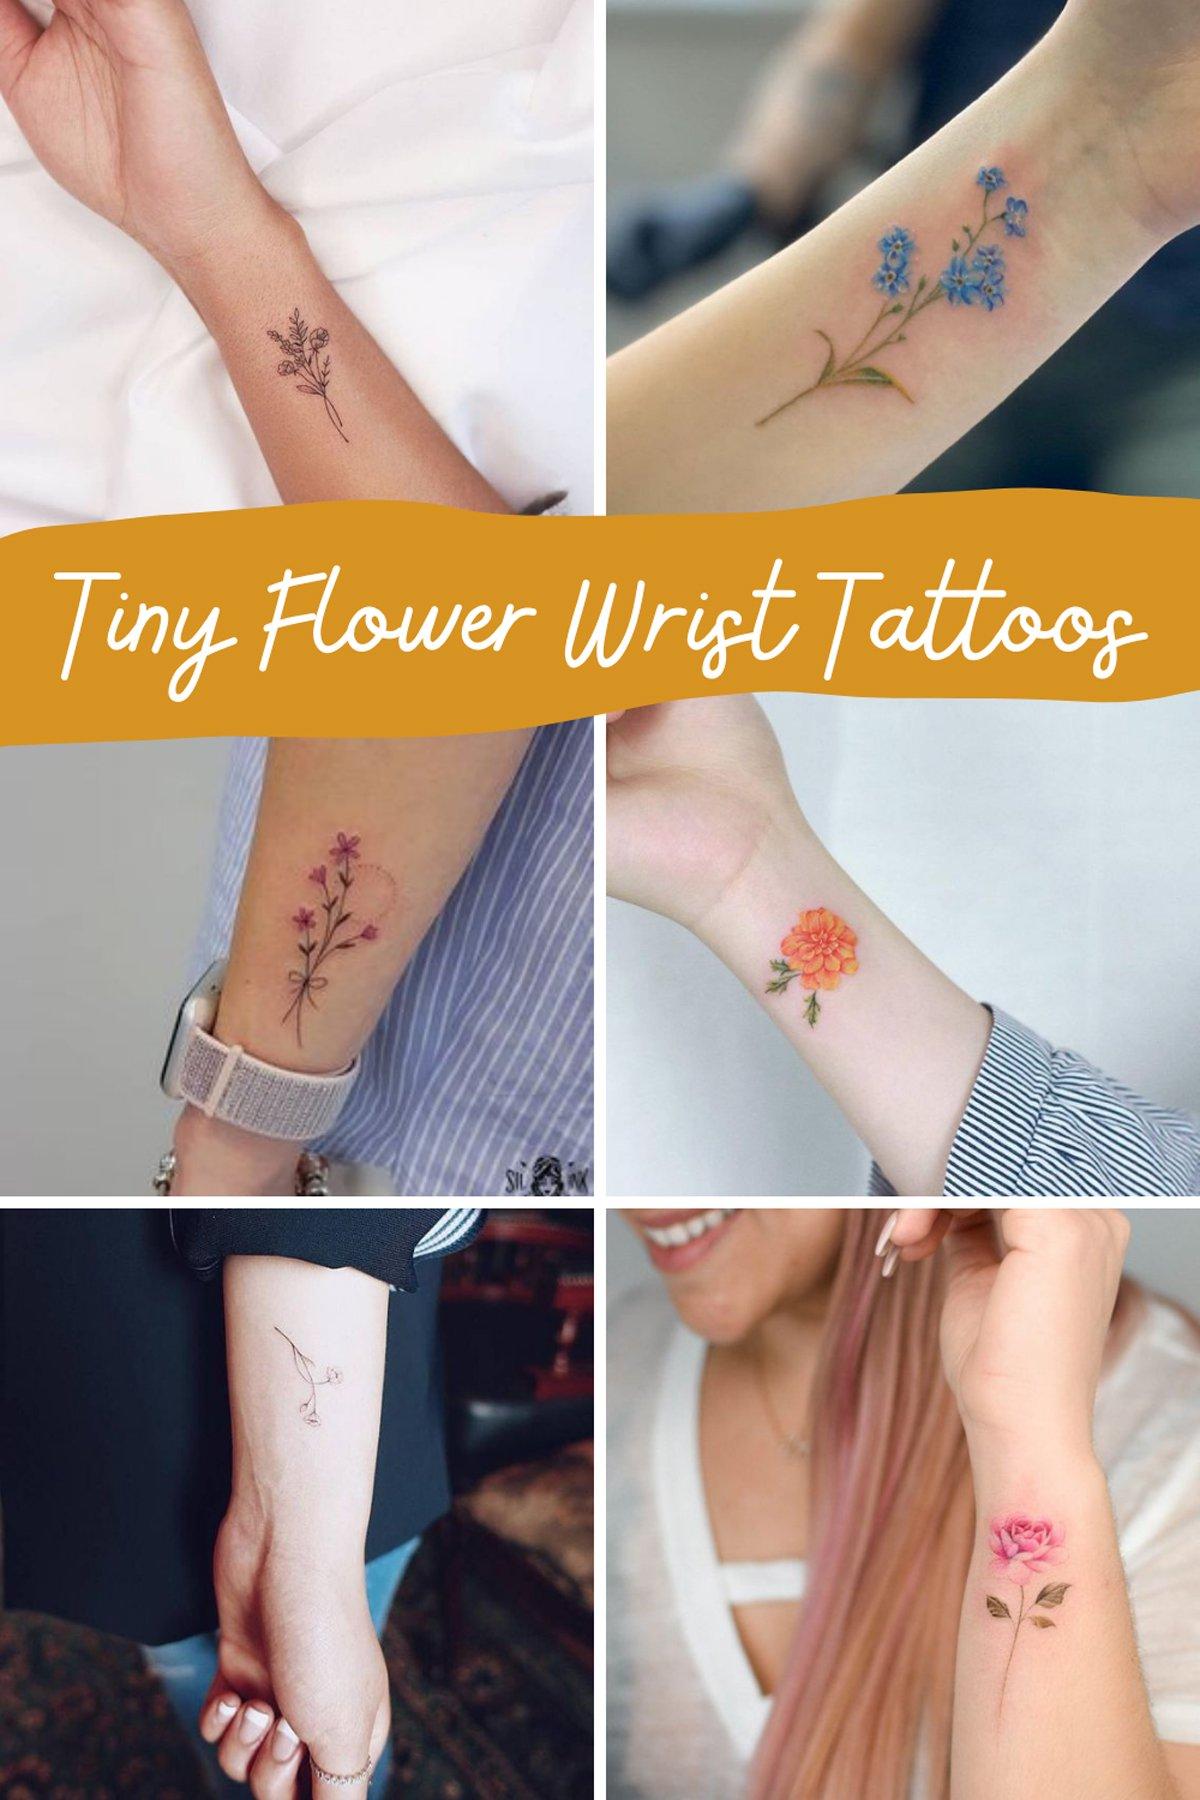 Cute Small Flower Tattoos